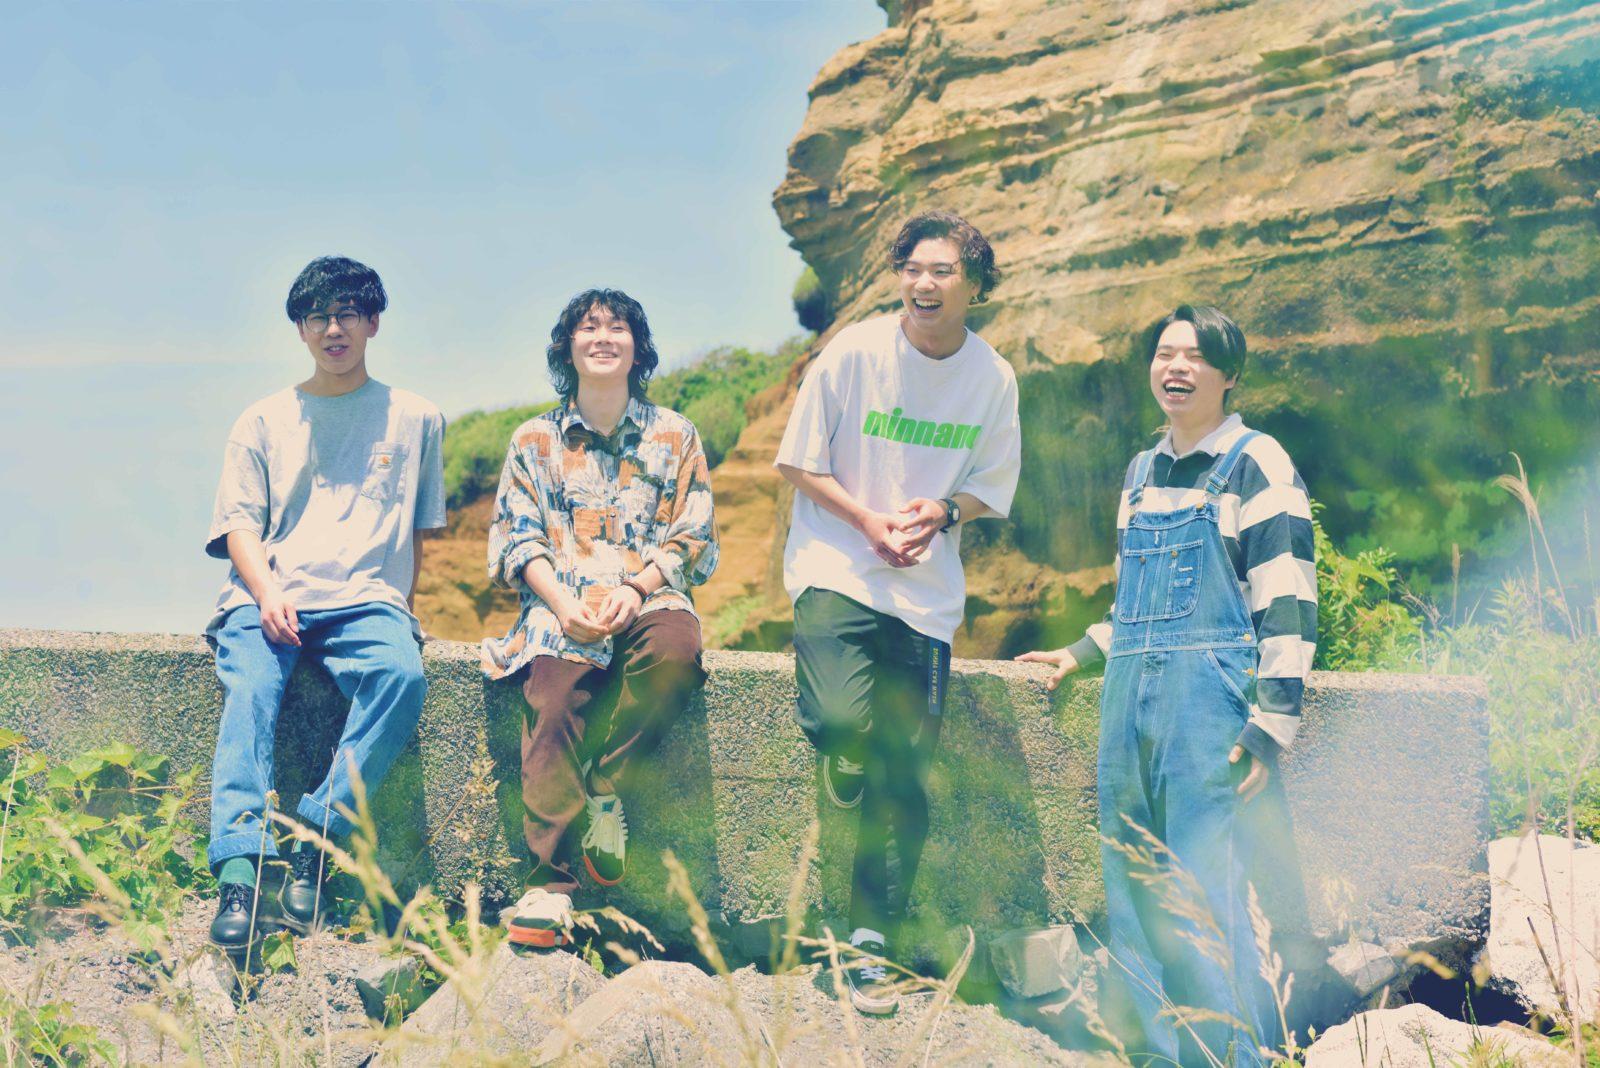 kobore、メジャーデビューアルバム「風景になって」をリリース&収録曲「FULLTEN」のMVを公開サムネイル画像